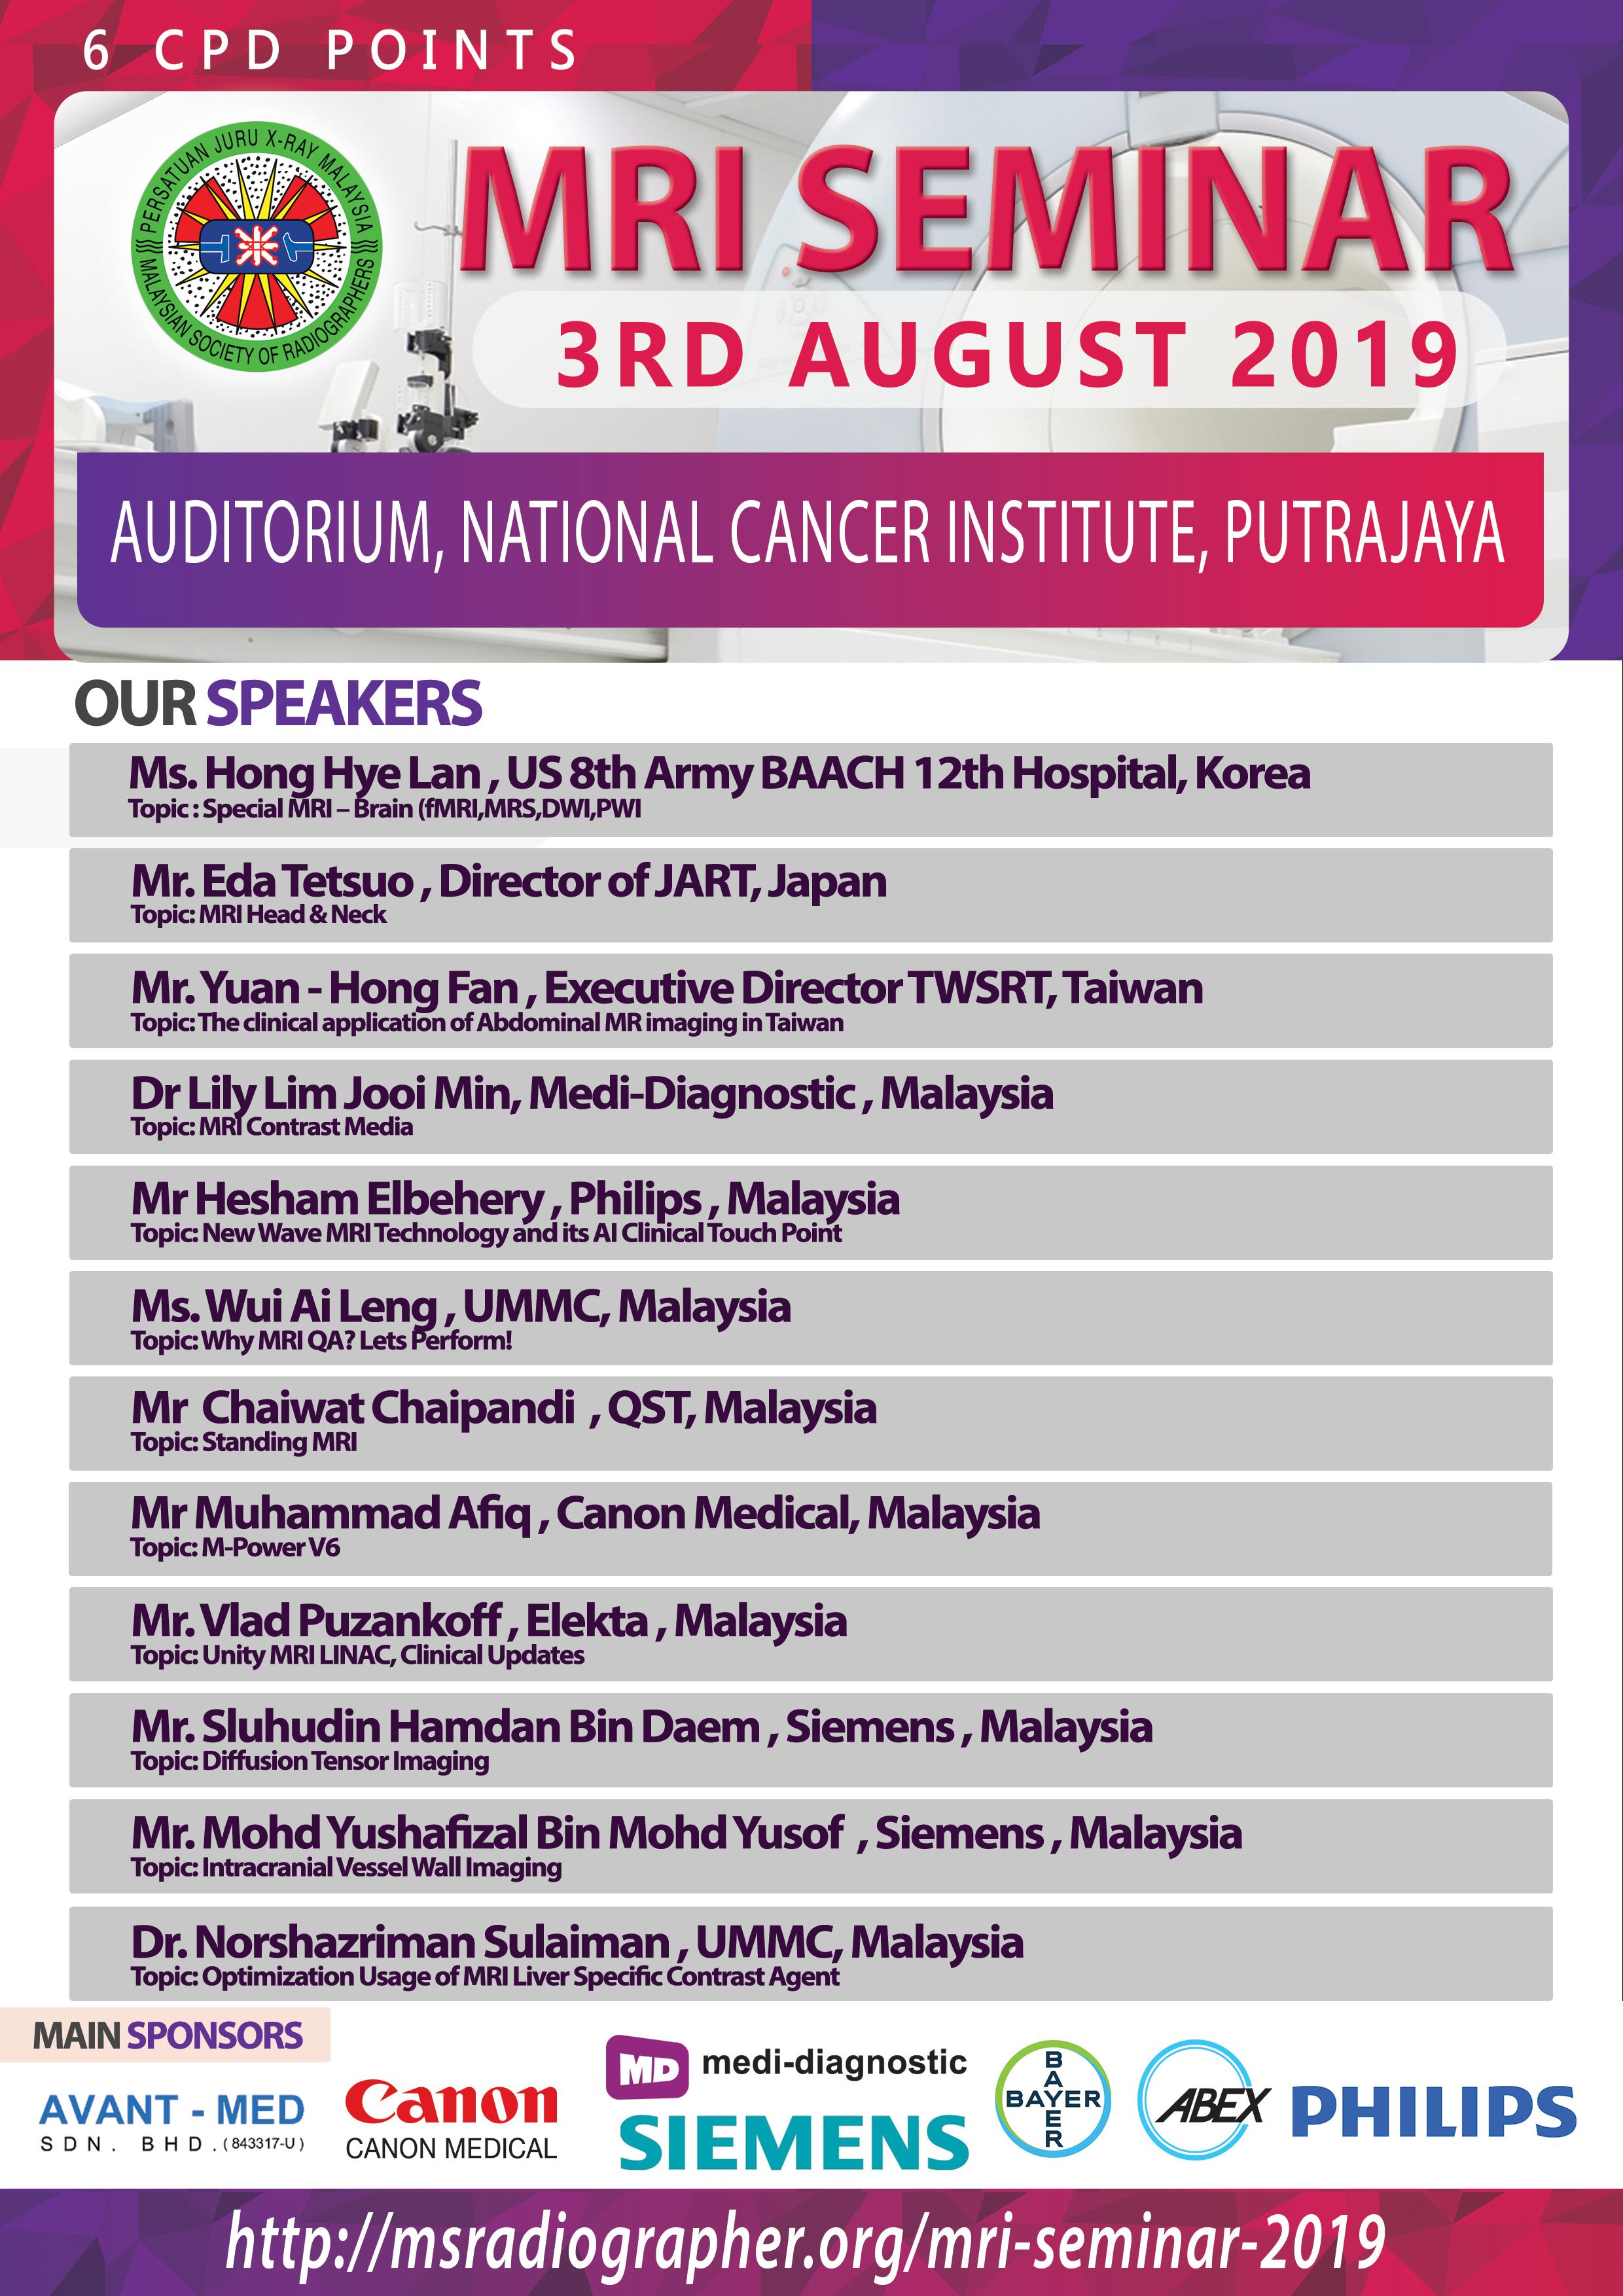 MRI Seminar 2019